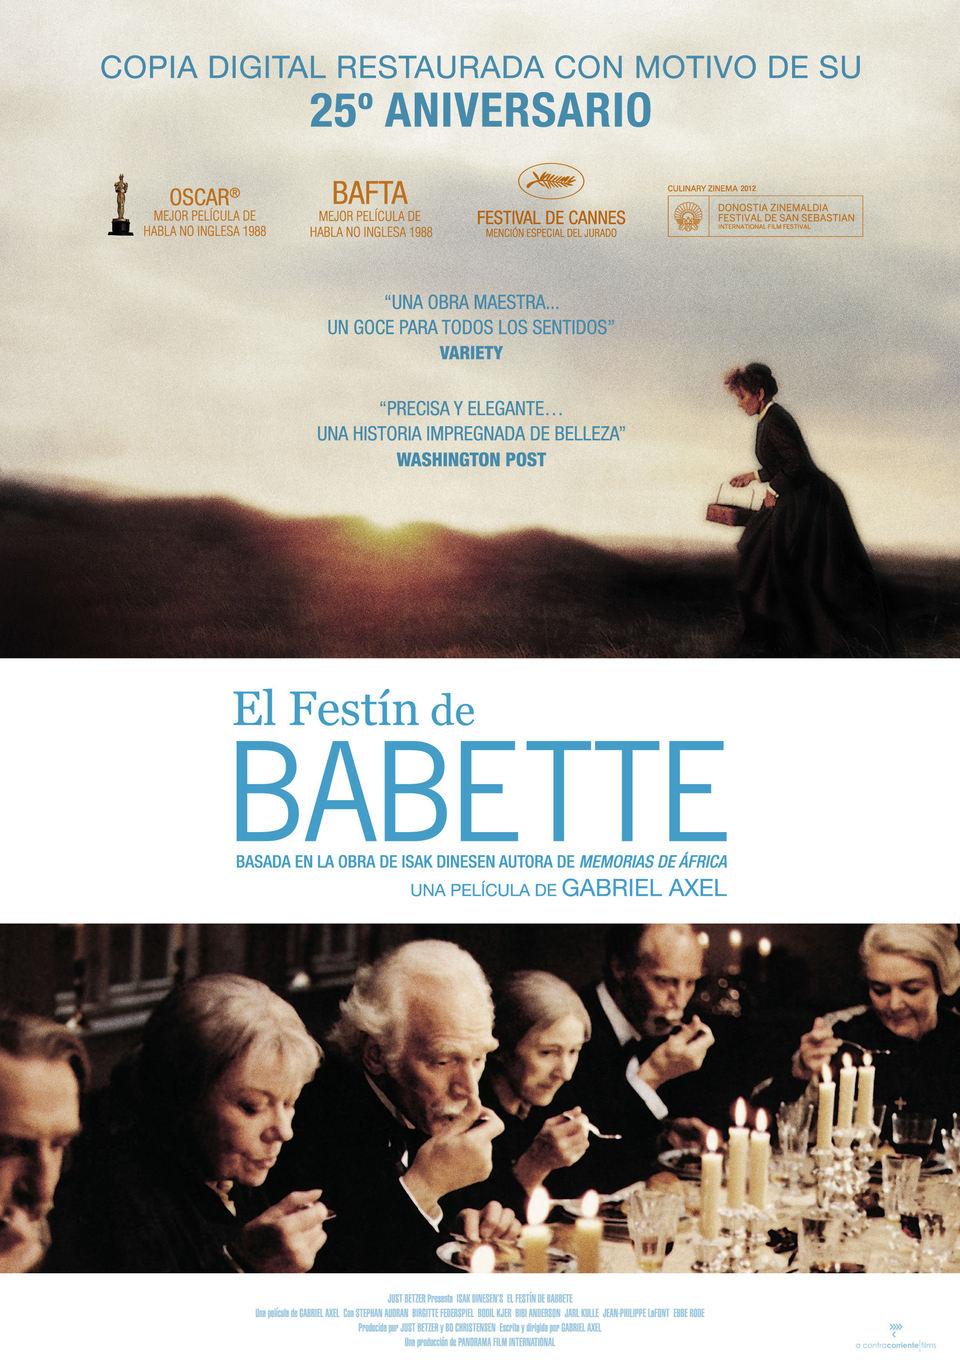 El_Festin_De_Babette-Caratula2.jpg